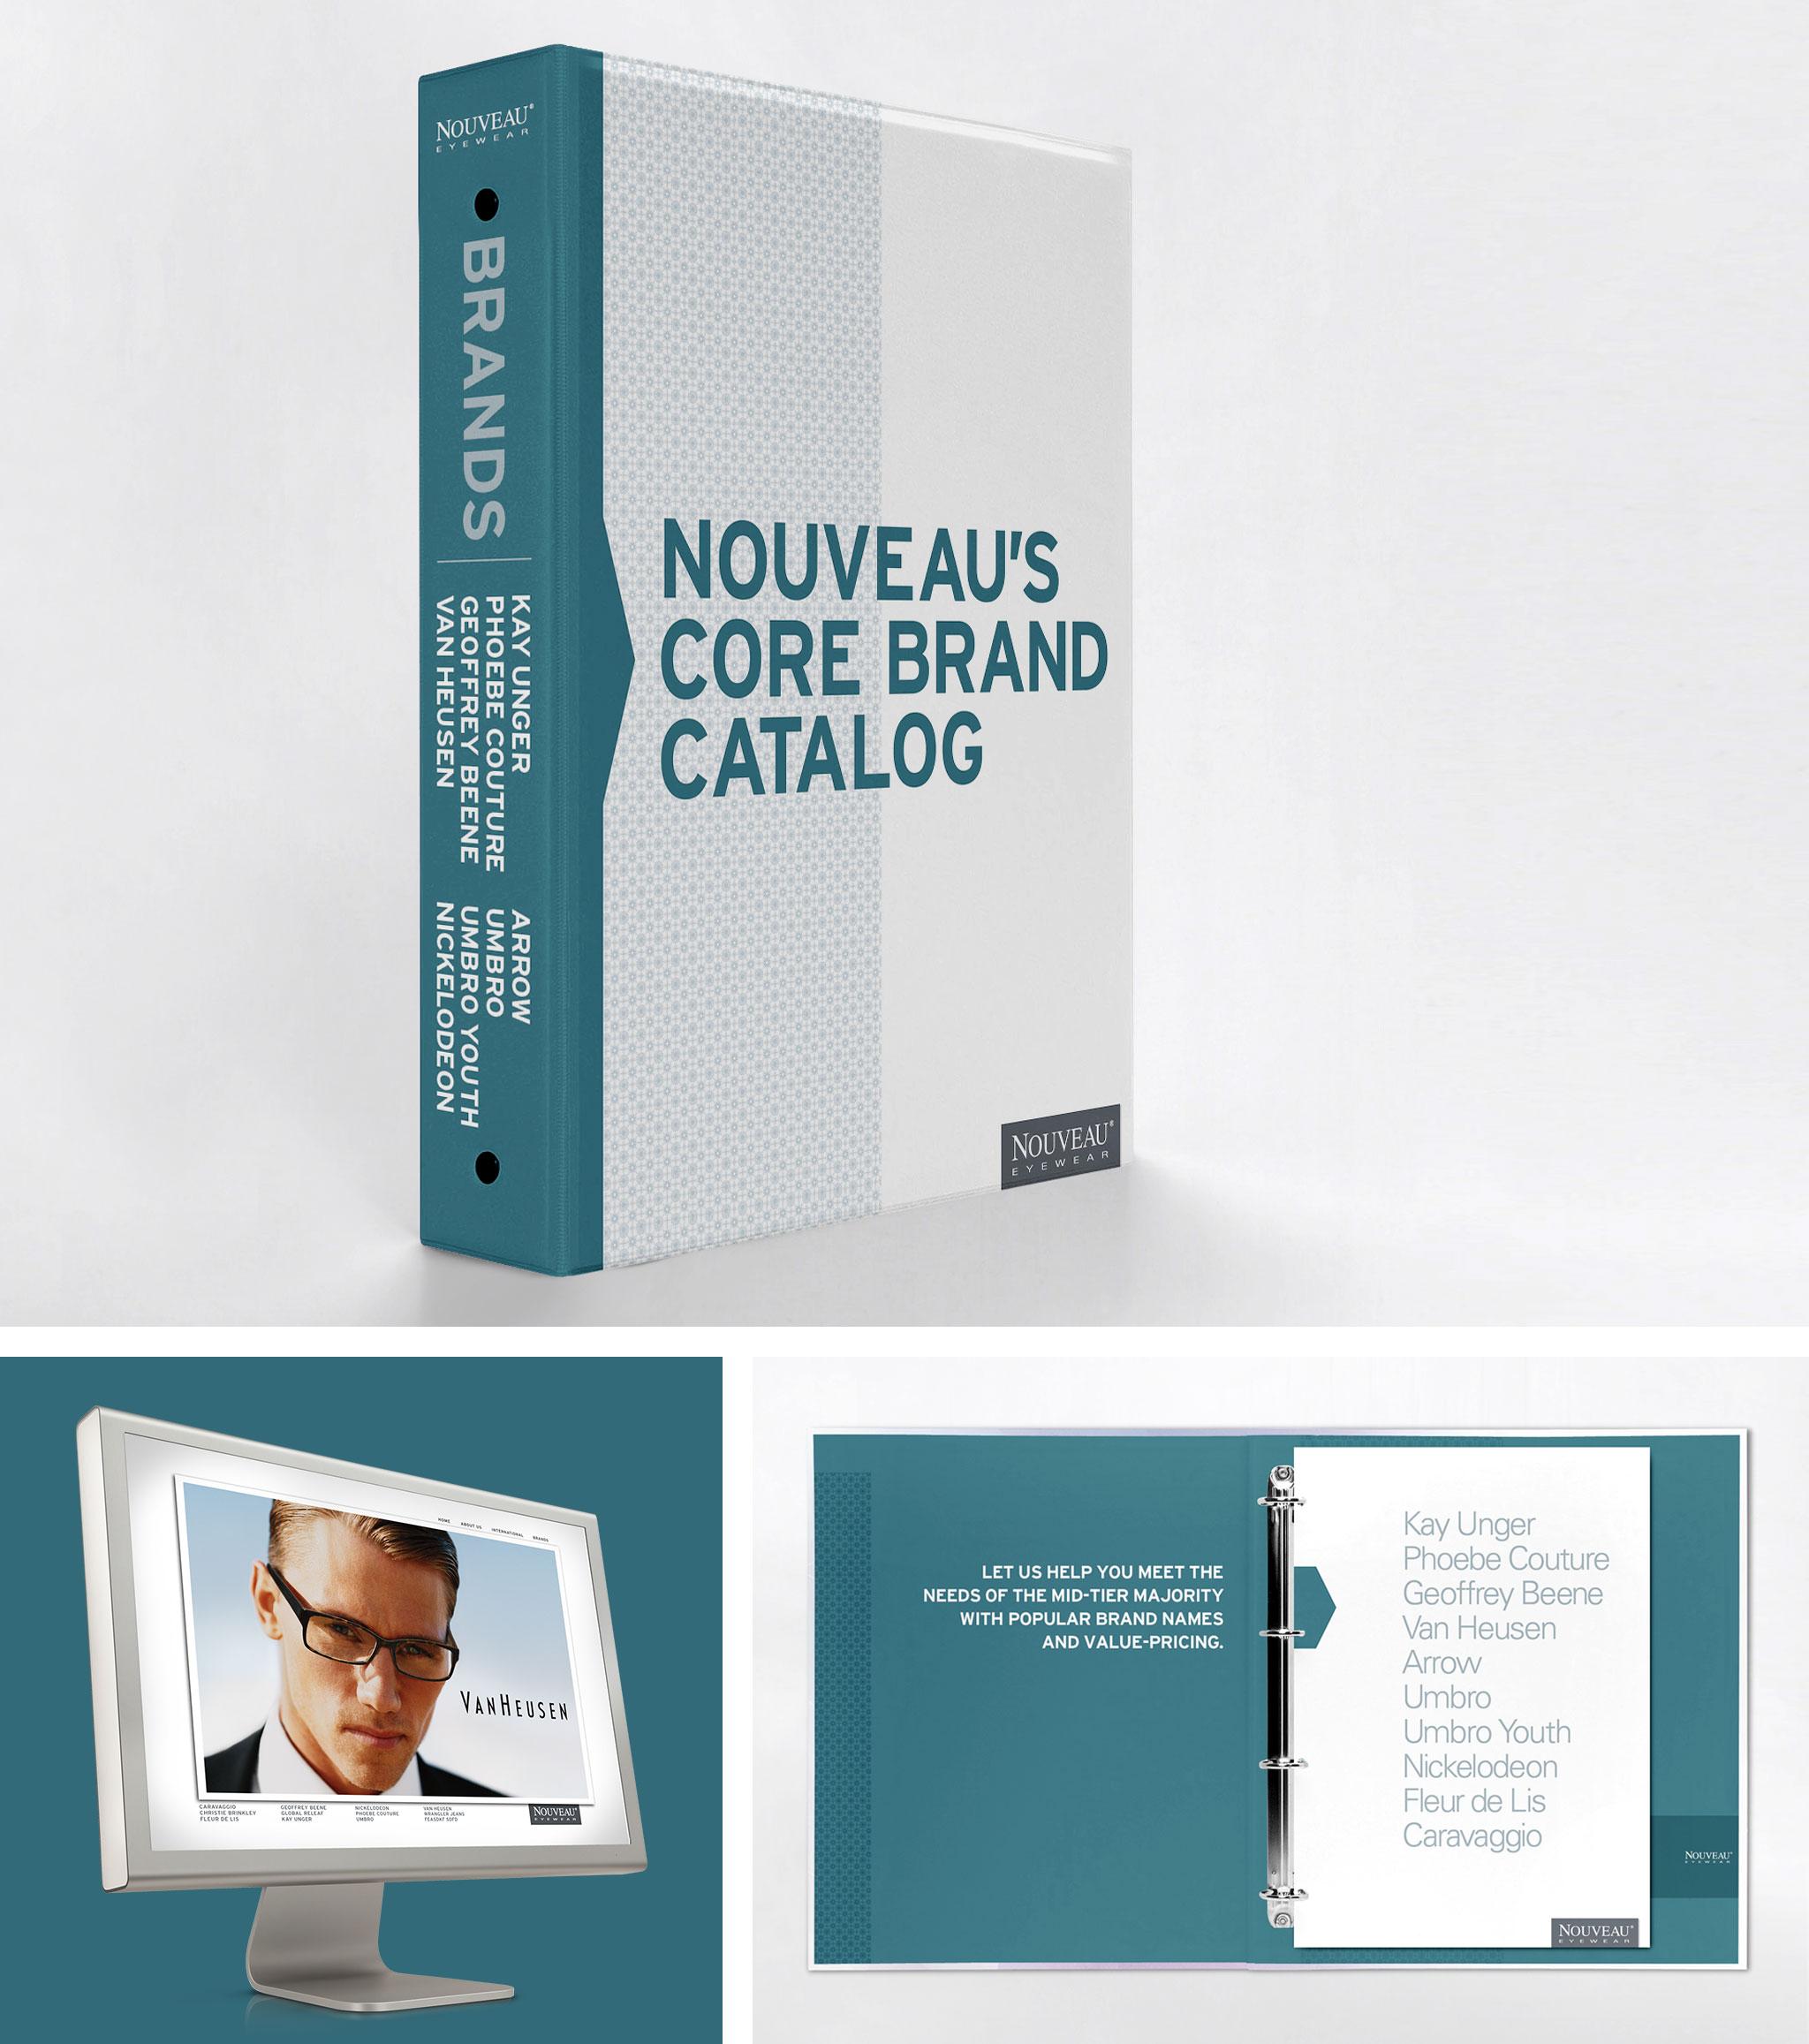 work_design_nouveau